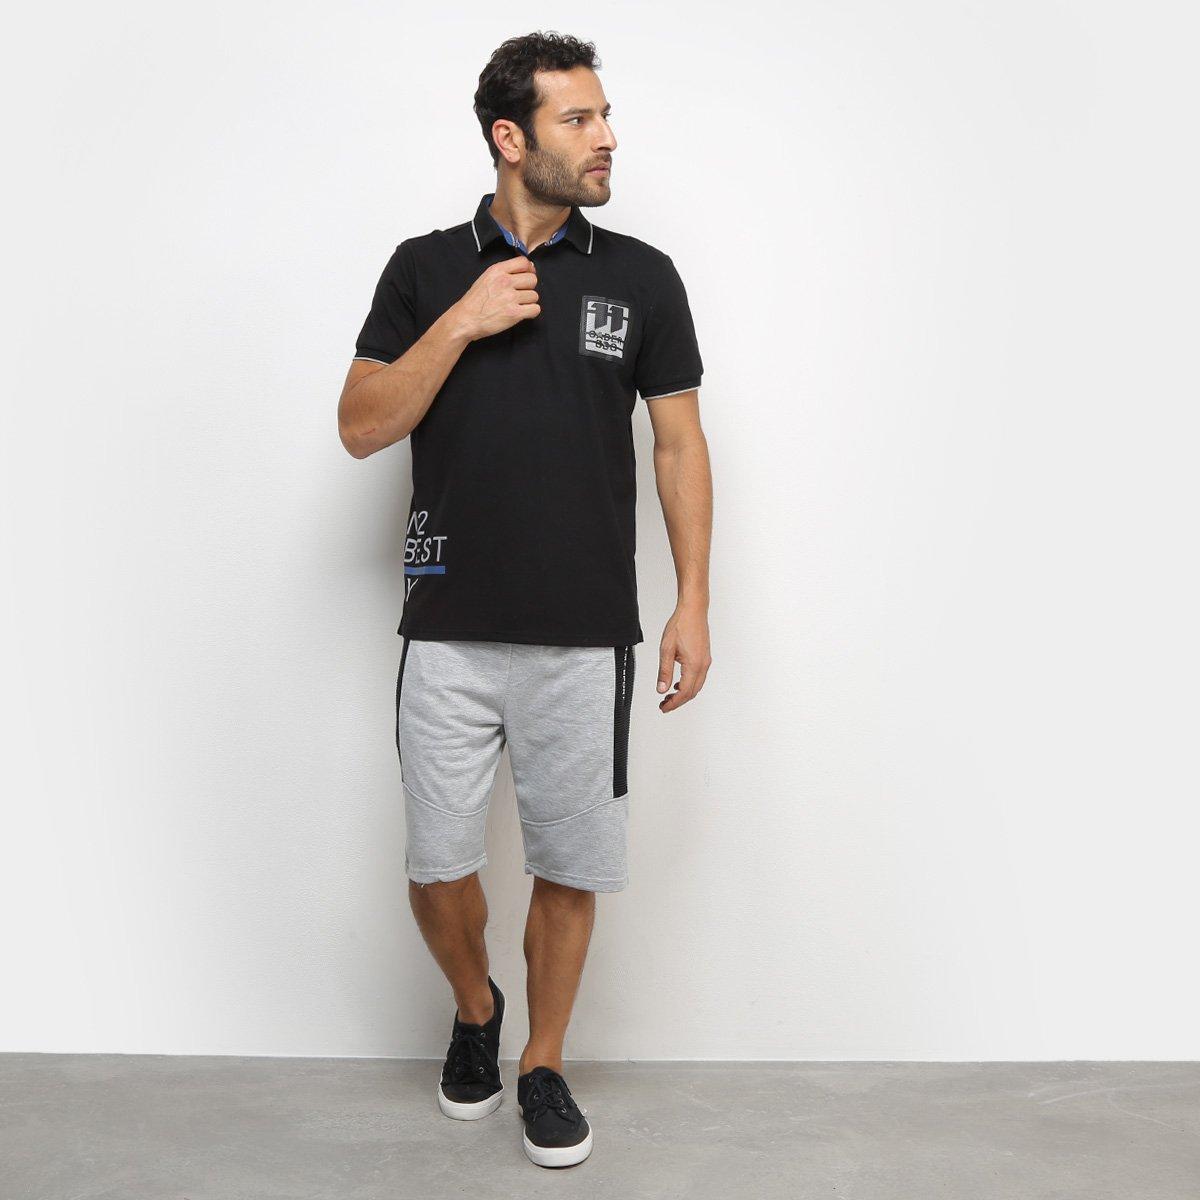 Camisa Polo Eagle Rock Gader BBO Masculina - Preto